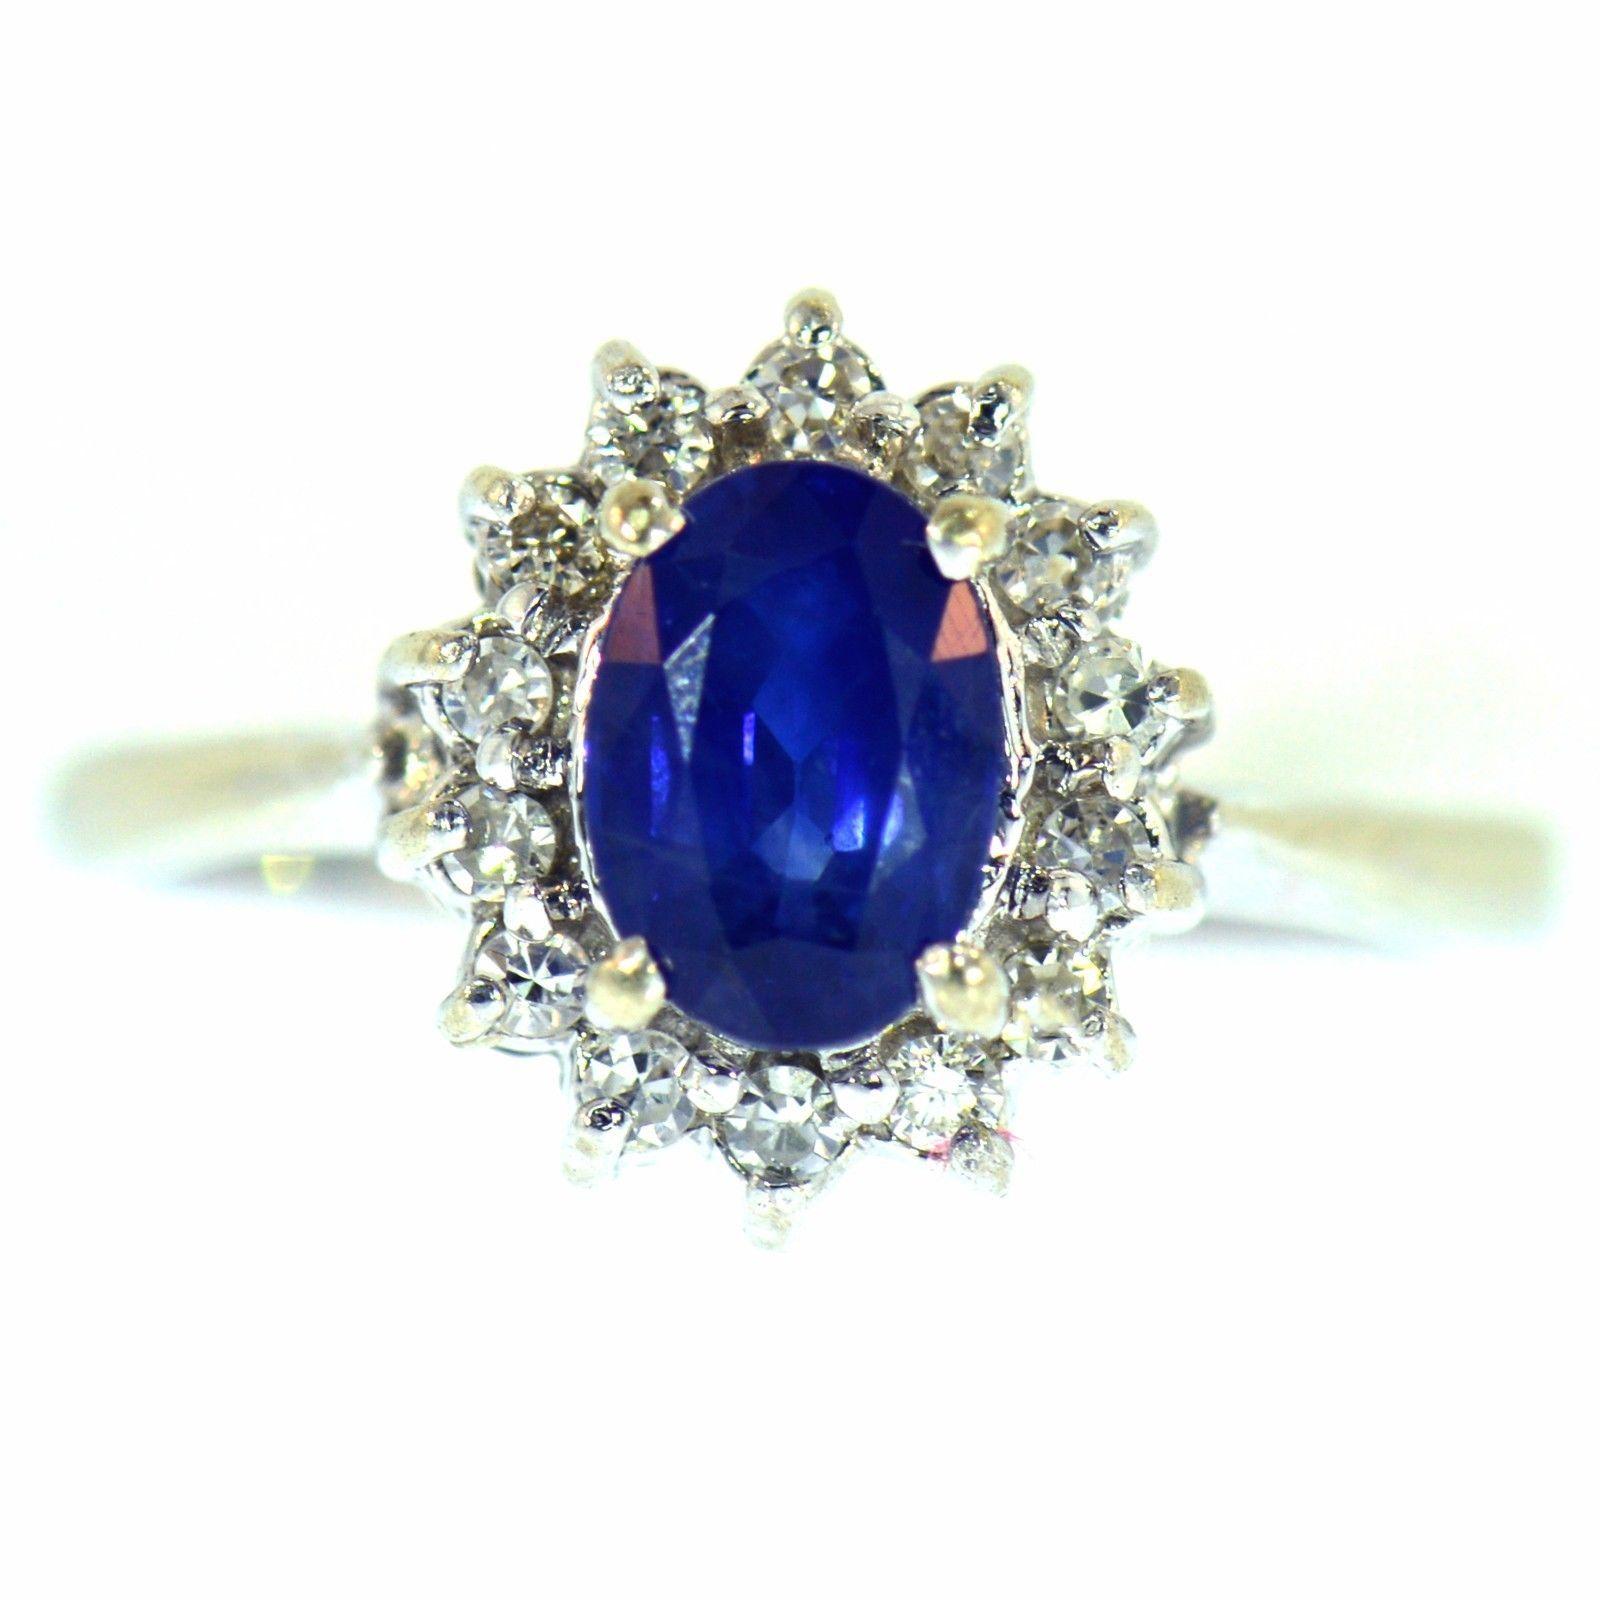 .75 CT BLUE SAPPHIRE & DIAMOND RING 14K WHITE GOLD FINE NATURAL OVAL CUT https://t.co/JaNKs0QtsG https://t.co/GPKk7OD1zd http://twitter.com/Soivzo_Riodge/status/774498778715942912